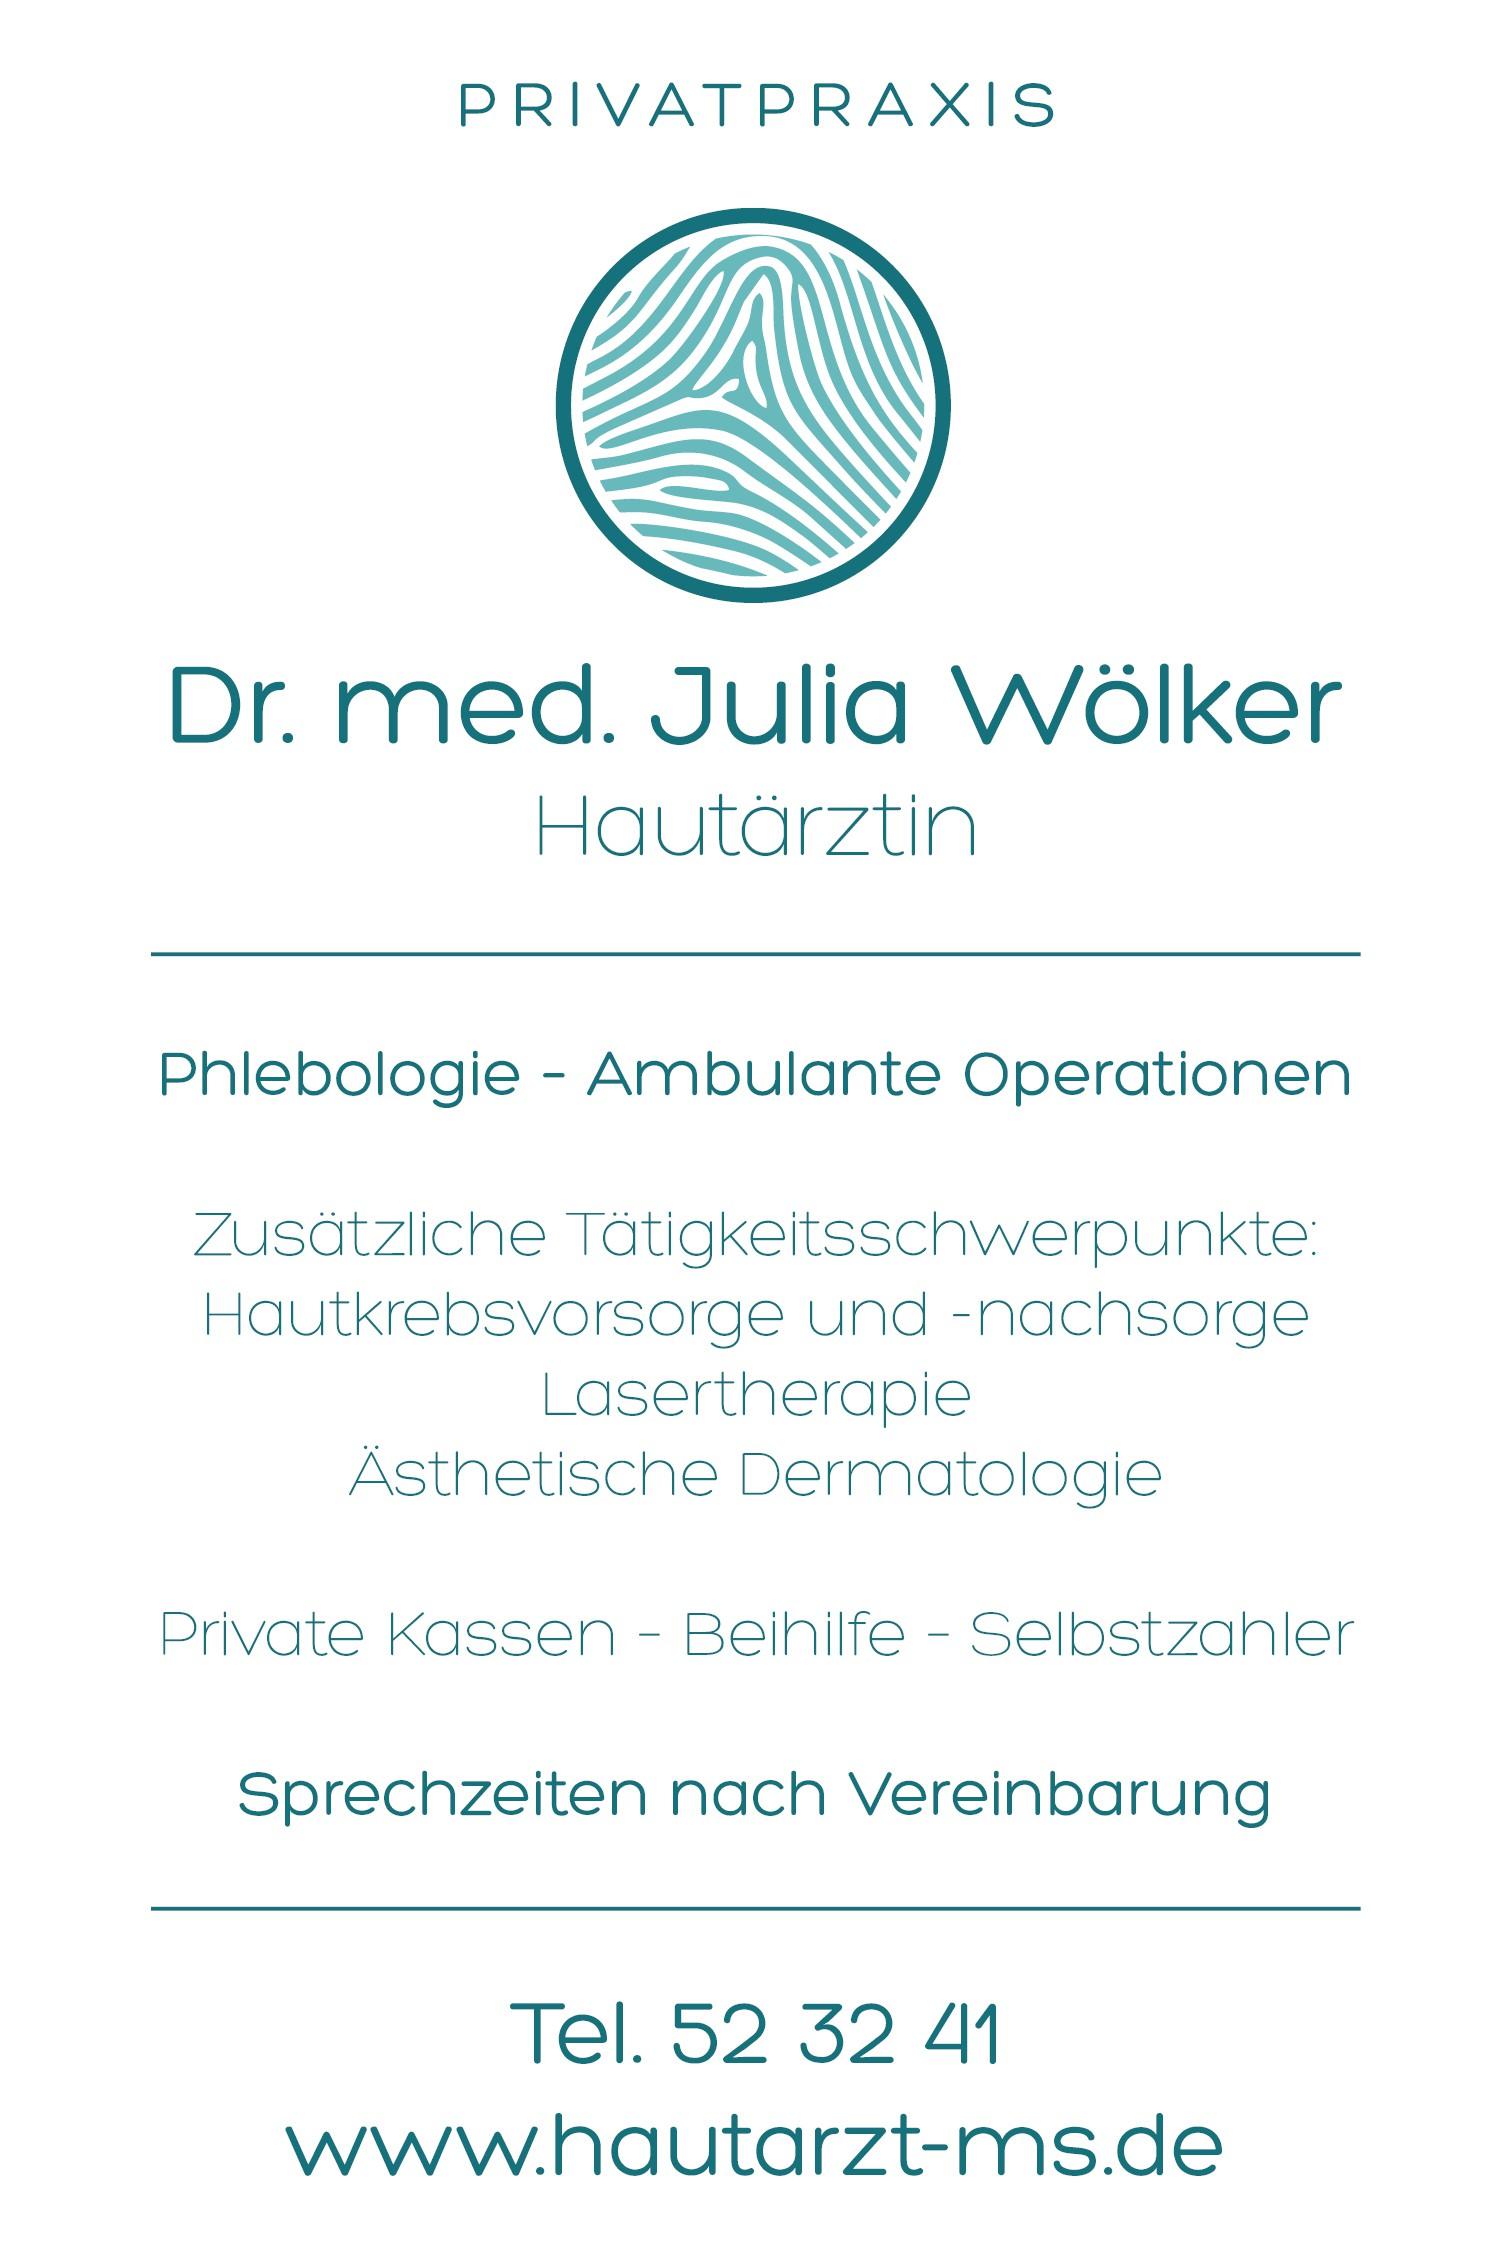 Firmenschild, Stempel, Briefumschlag + Logografik